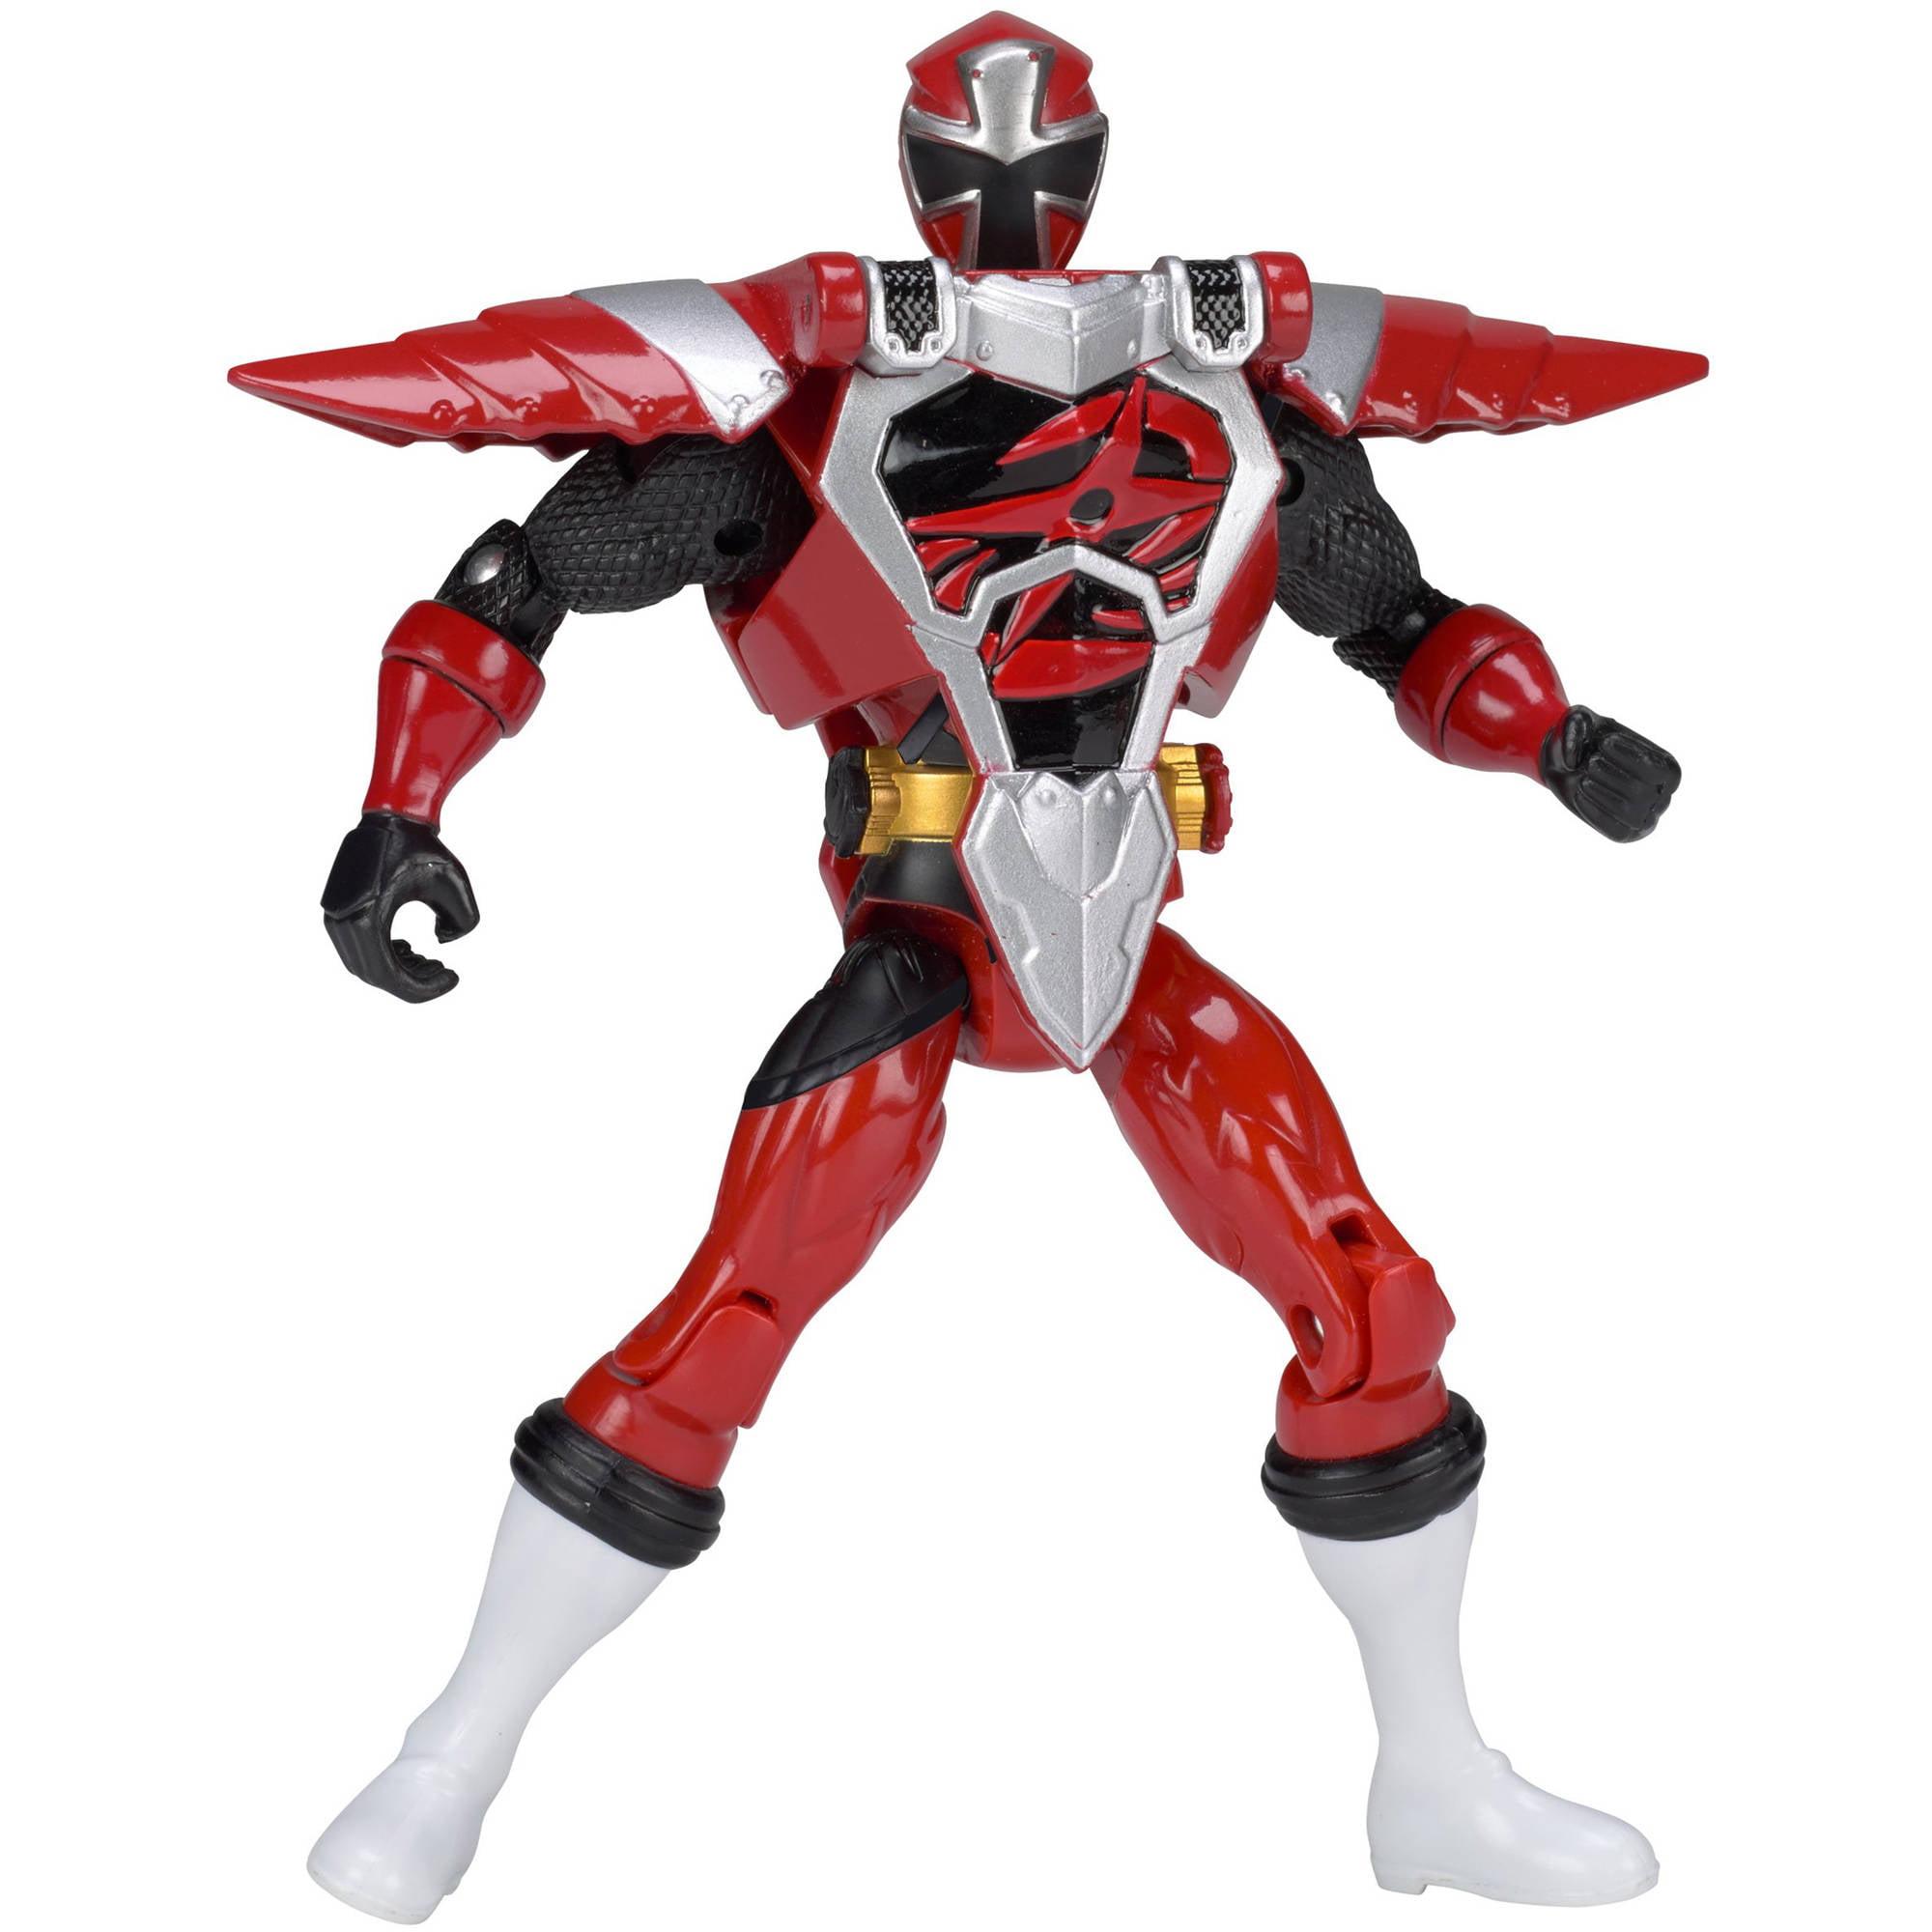 Power Rangers Ninja Steel Armored Red Ranger by Bandai America, Inc